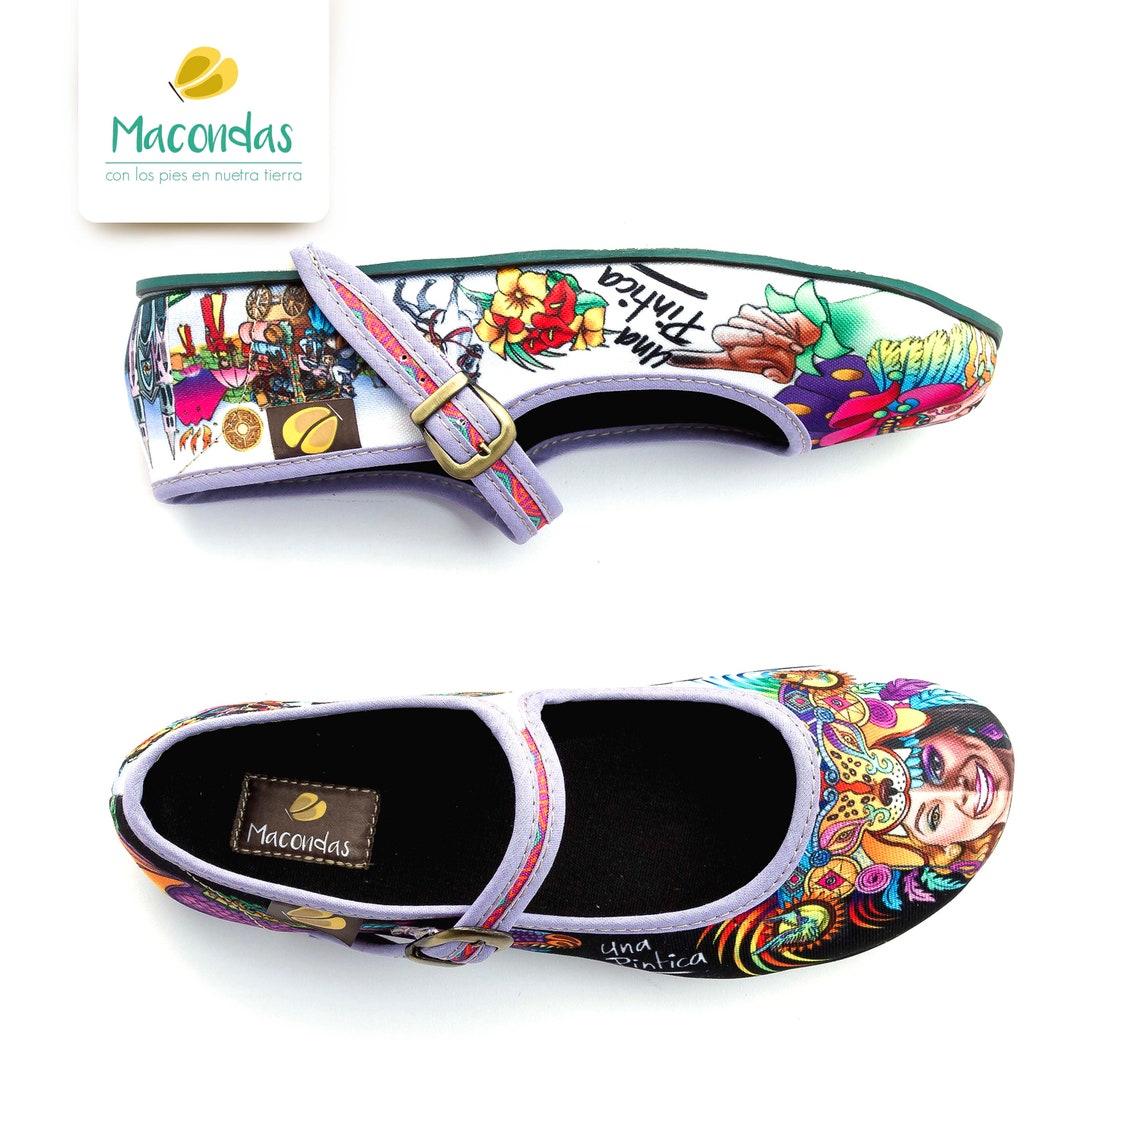 Carnaval Mardi Gras Festival Colorful Celebration Artsy Gift